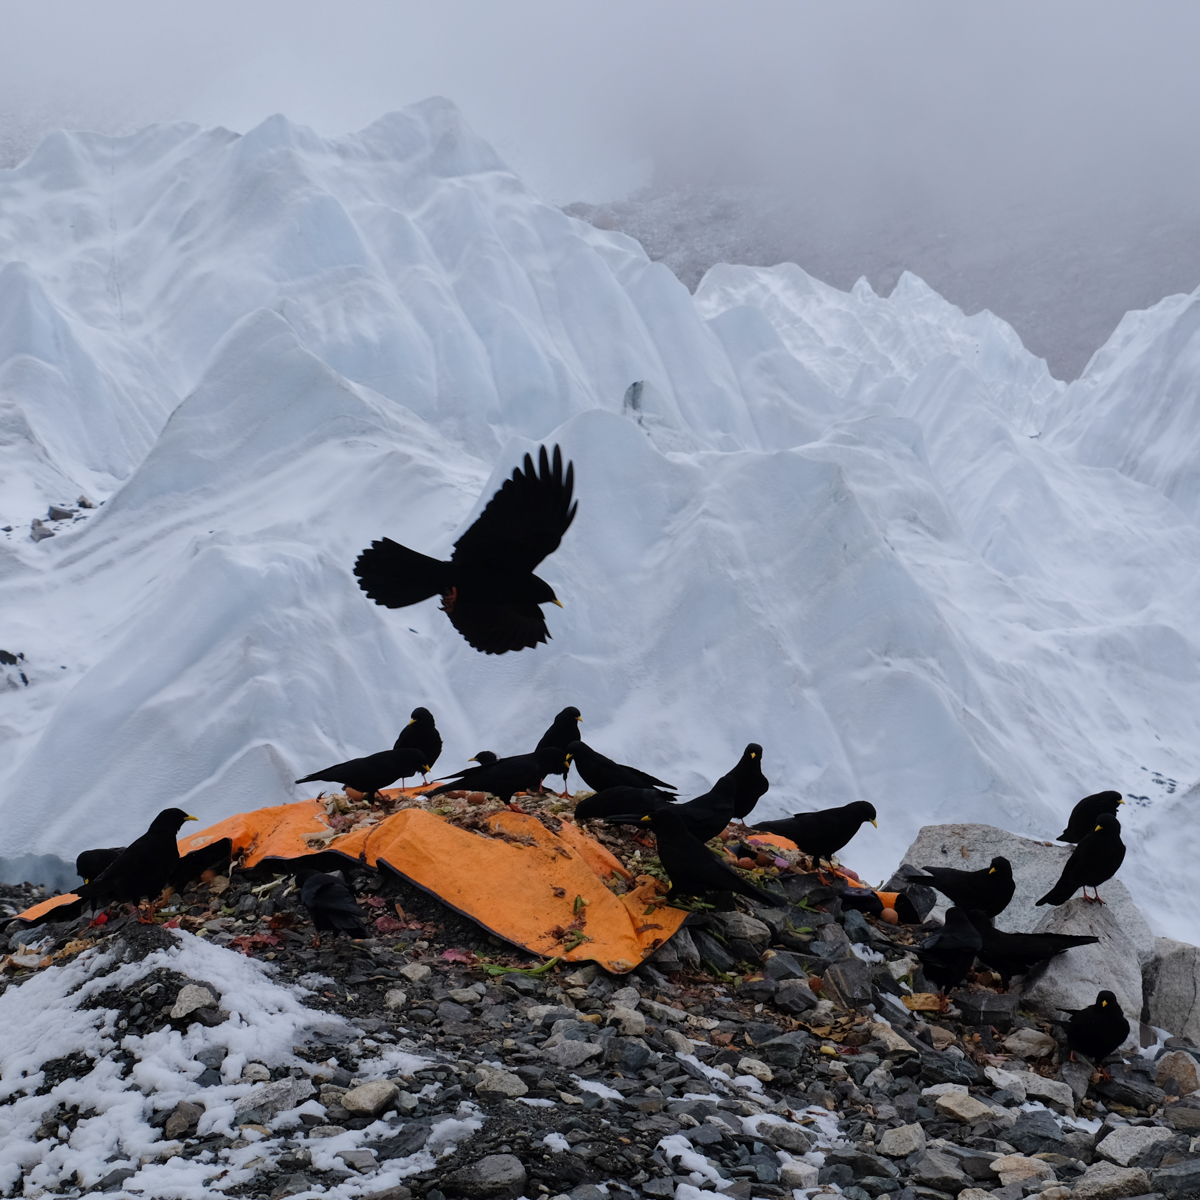 Everest Base Camp, Everest 3 pass #2 42